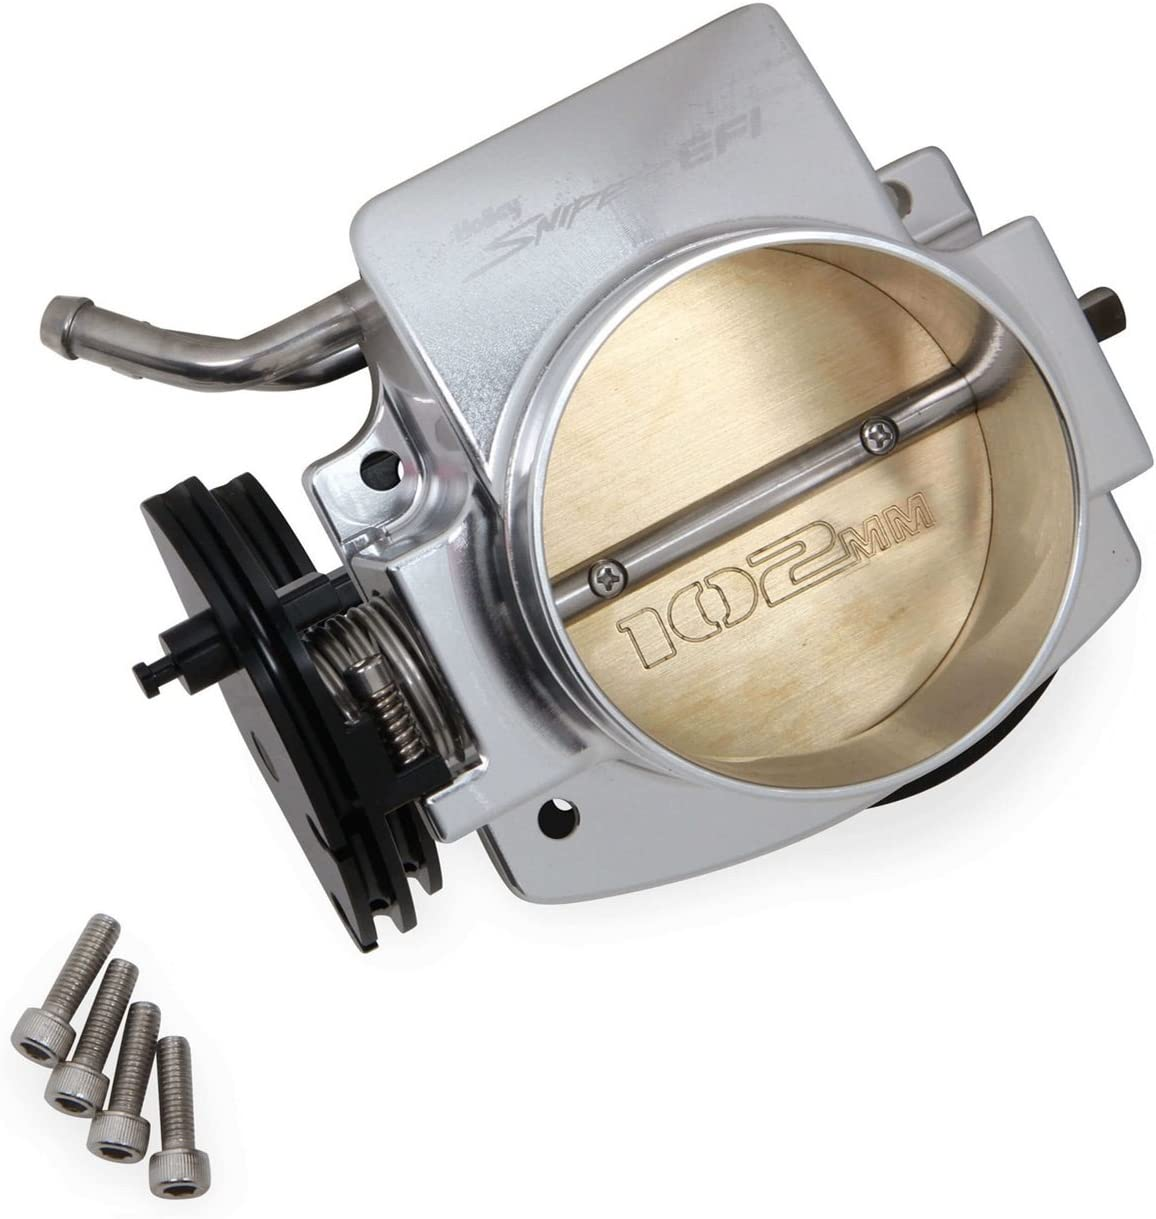 Holley 860002-1 Sniper EFI Throttle Body 102 mm Billet Aluminum Silver Sniper EFI Throttle Body 71fTrbS2BPtLSL1500_